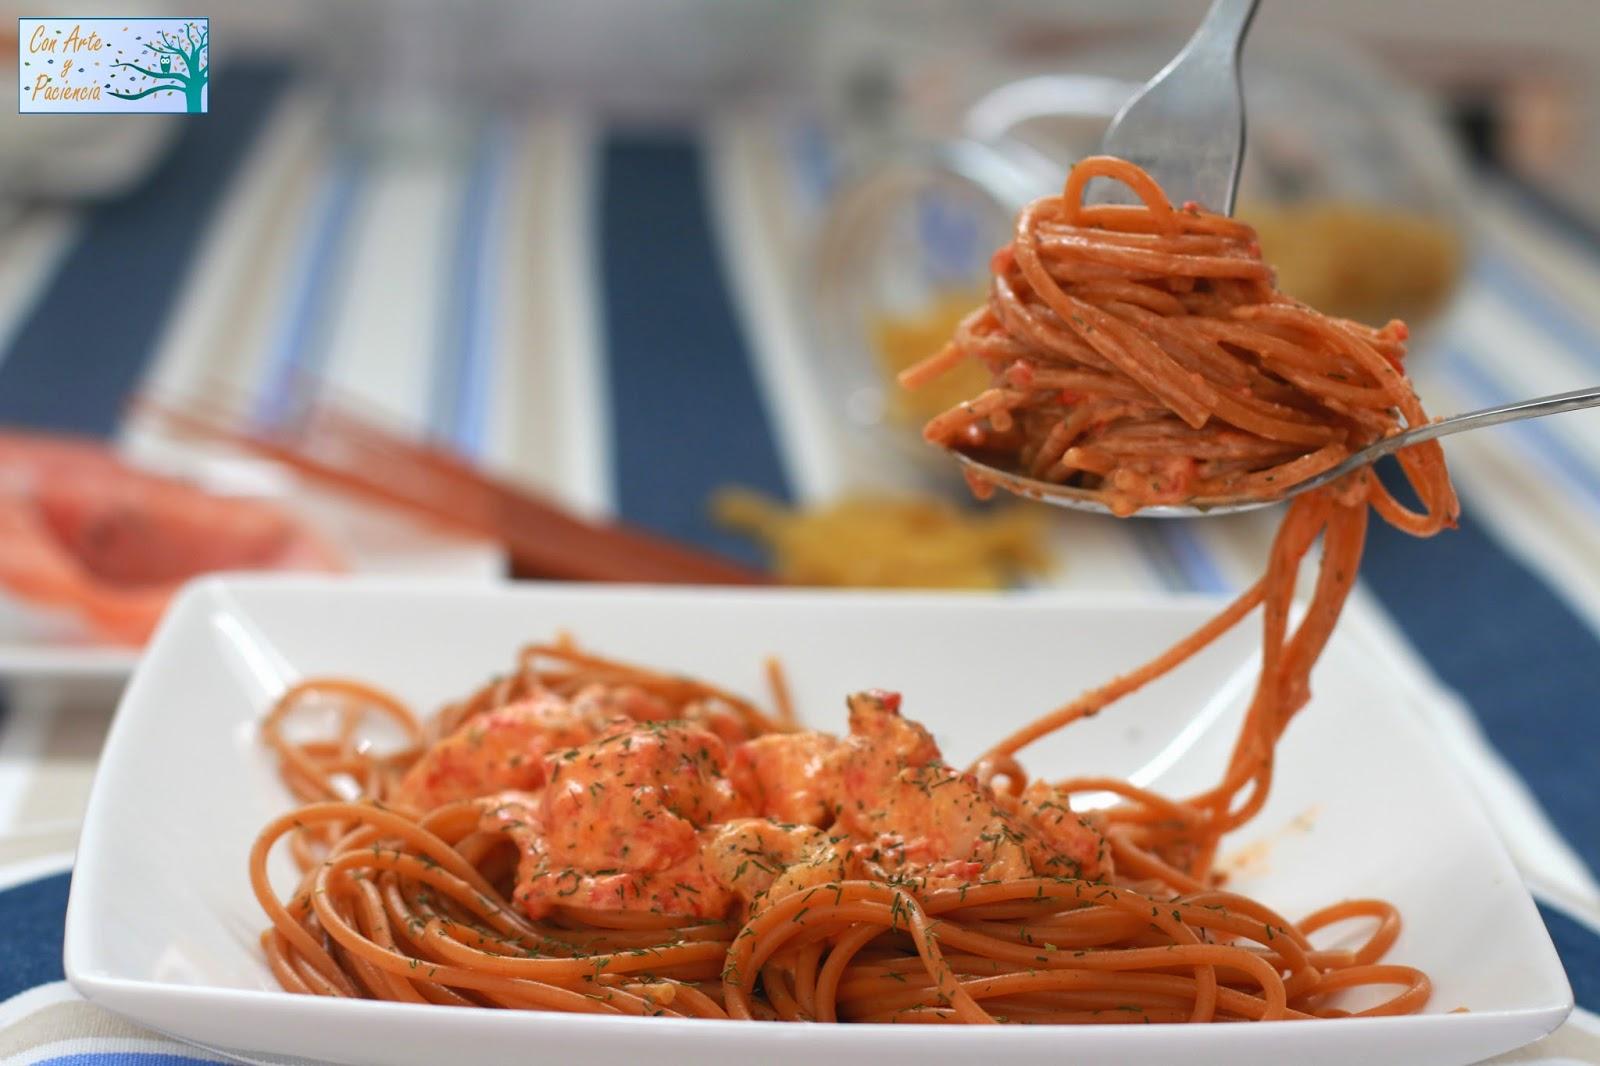 espaguetis.rojos,salmón,gambas,ajo,pimiento,receta,italiana,fácil,sencilla,recipe,casero,homemade,elegante,amigos,cena,rica,buenísima,pasta,vino,blanco,eneldo,tomate,nata,salsa,sauce